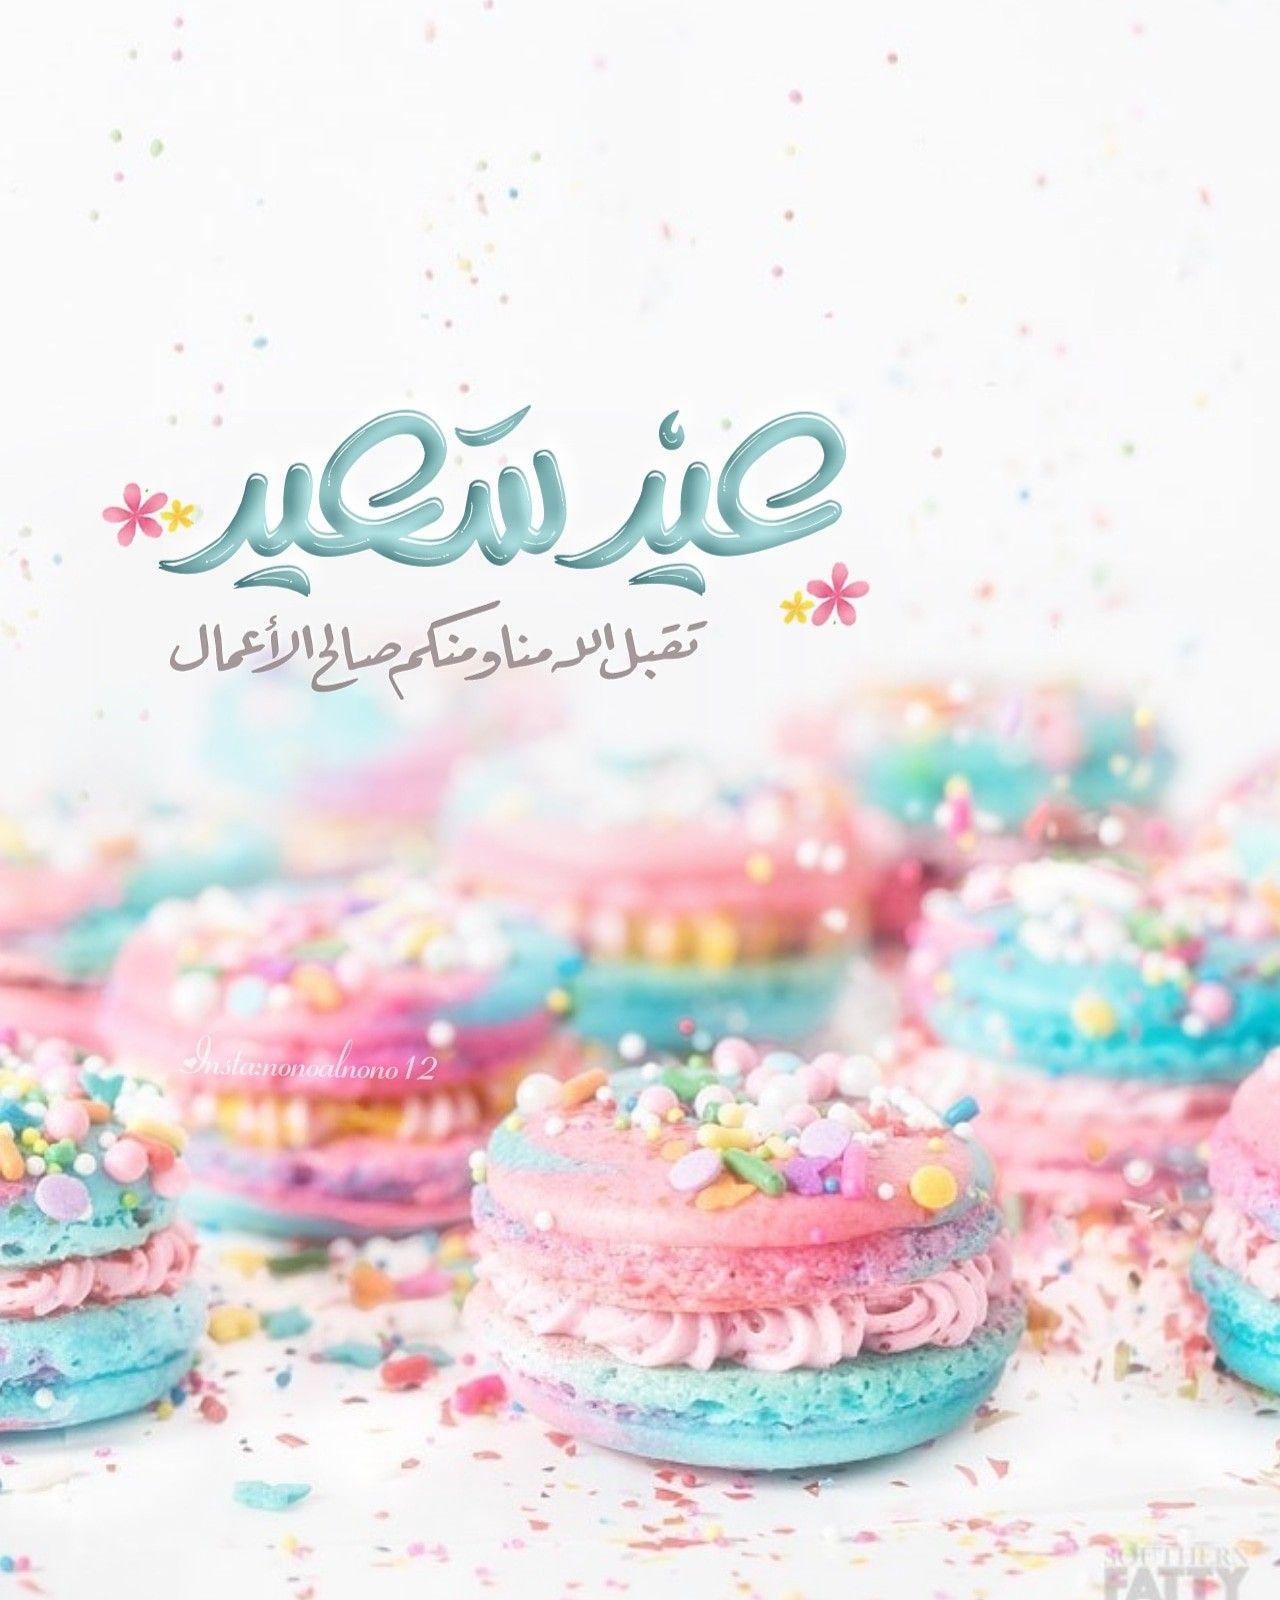 عيد سعيد Eid Mubarik Happy Eid Eid Mubarek